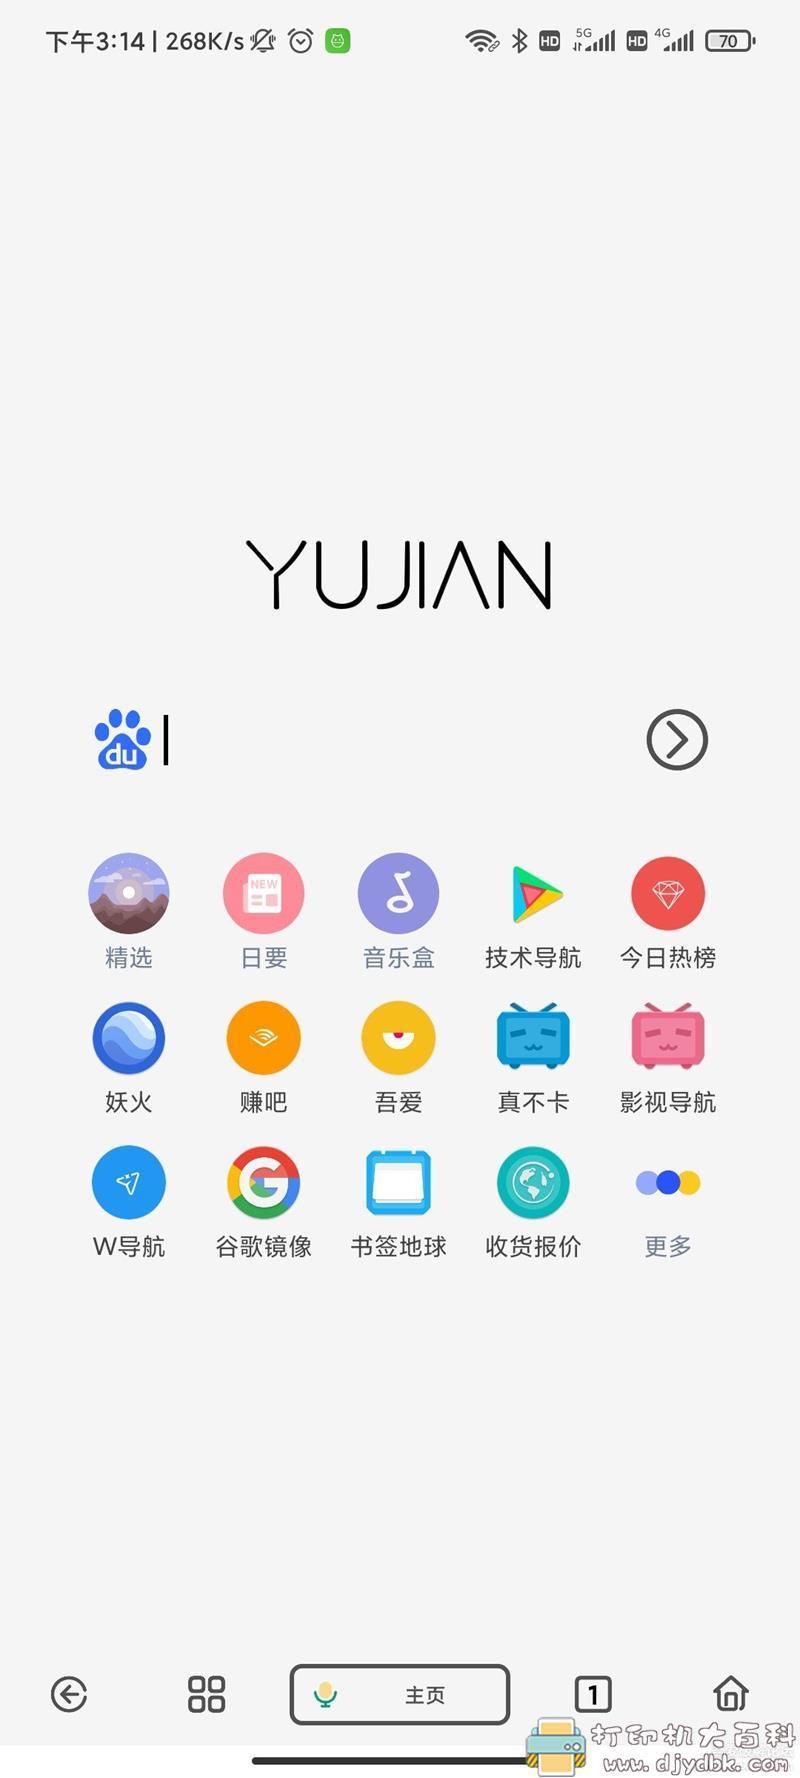 [Android]雨见浏览器5.9.5 带嗅探功能 秒搜剧 配图 No.5